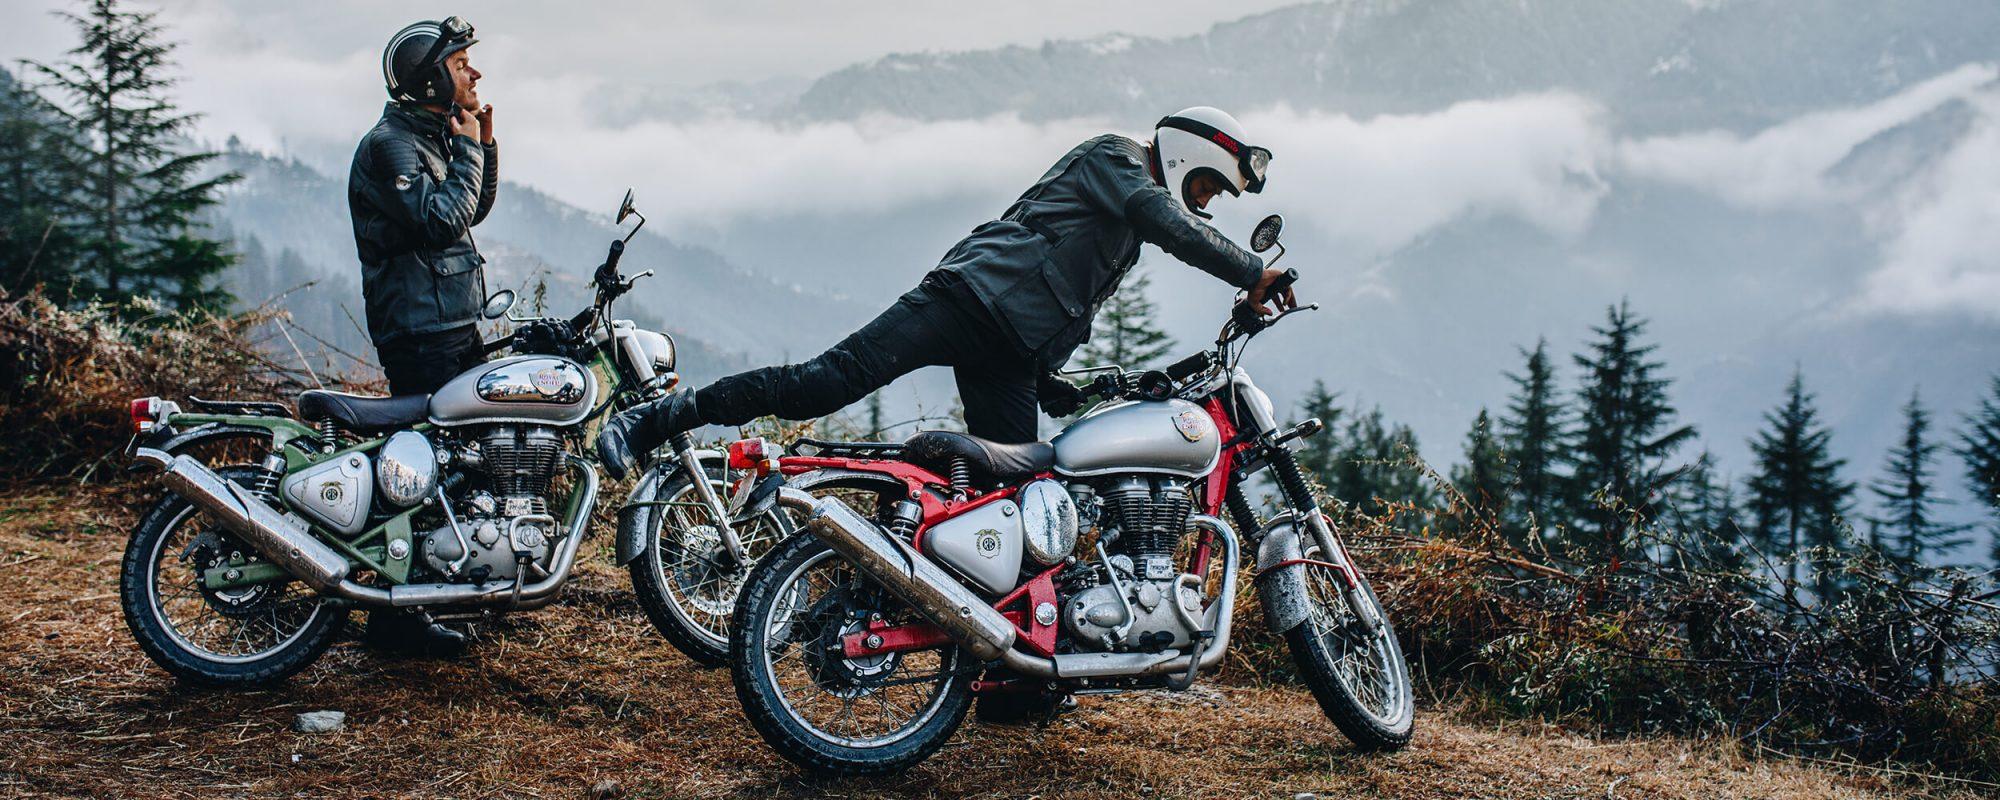 Royal Enfield motorbikes